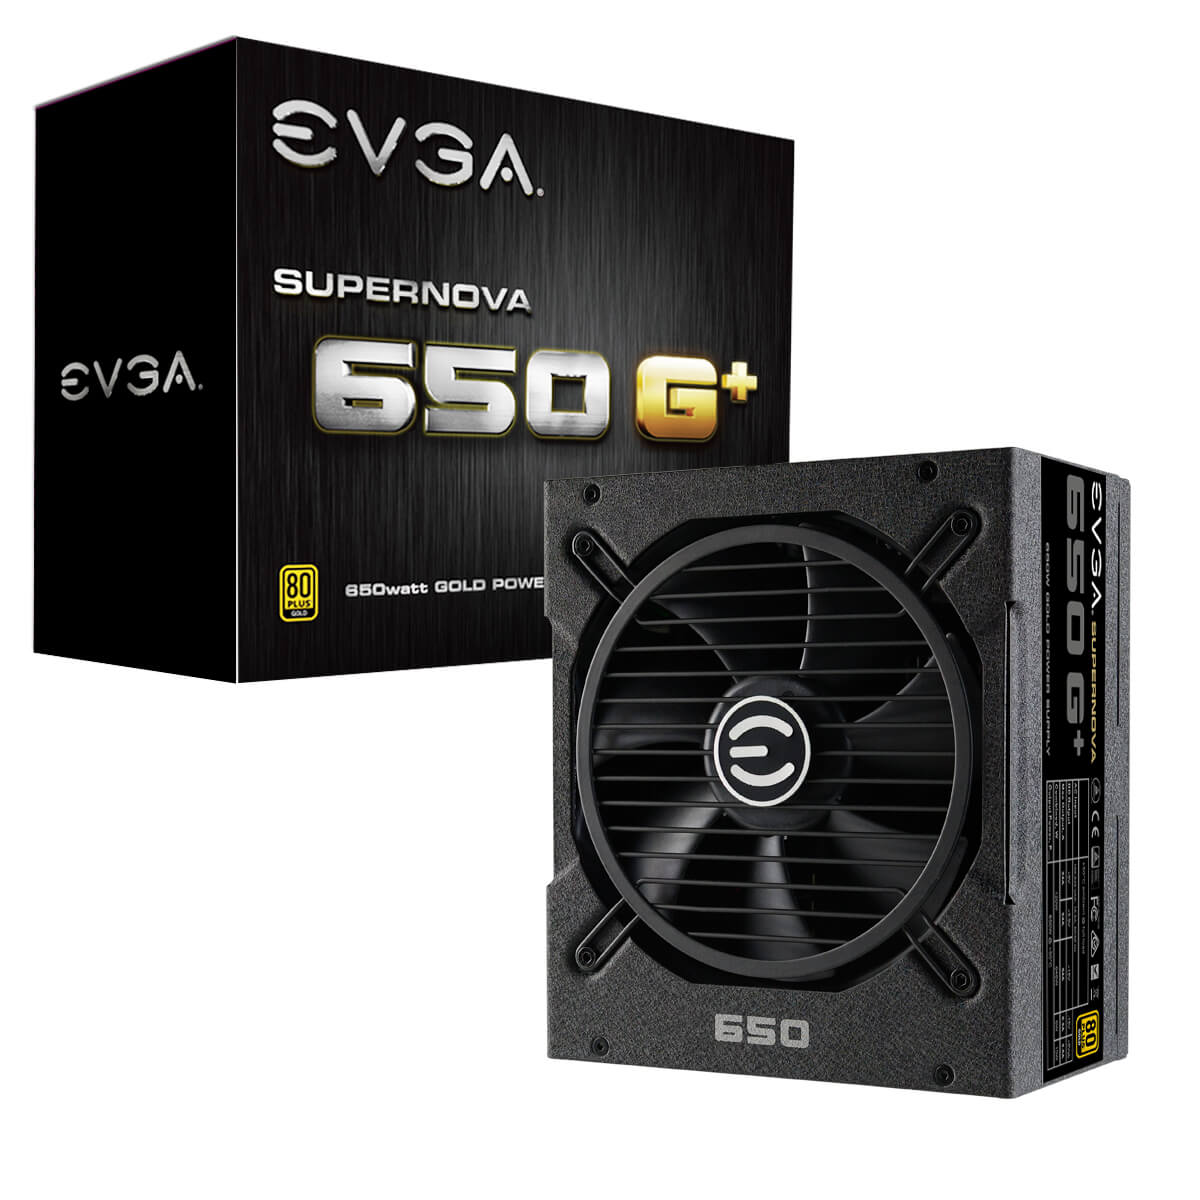 Sursa PC EVGA SuperNOVA 650 G1+ 80 Plus Gold 650W